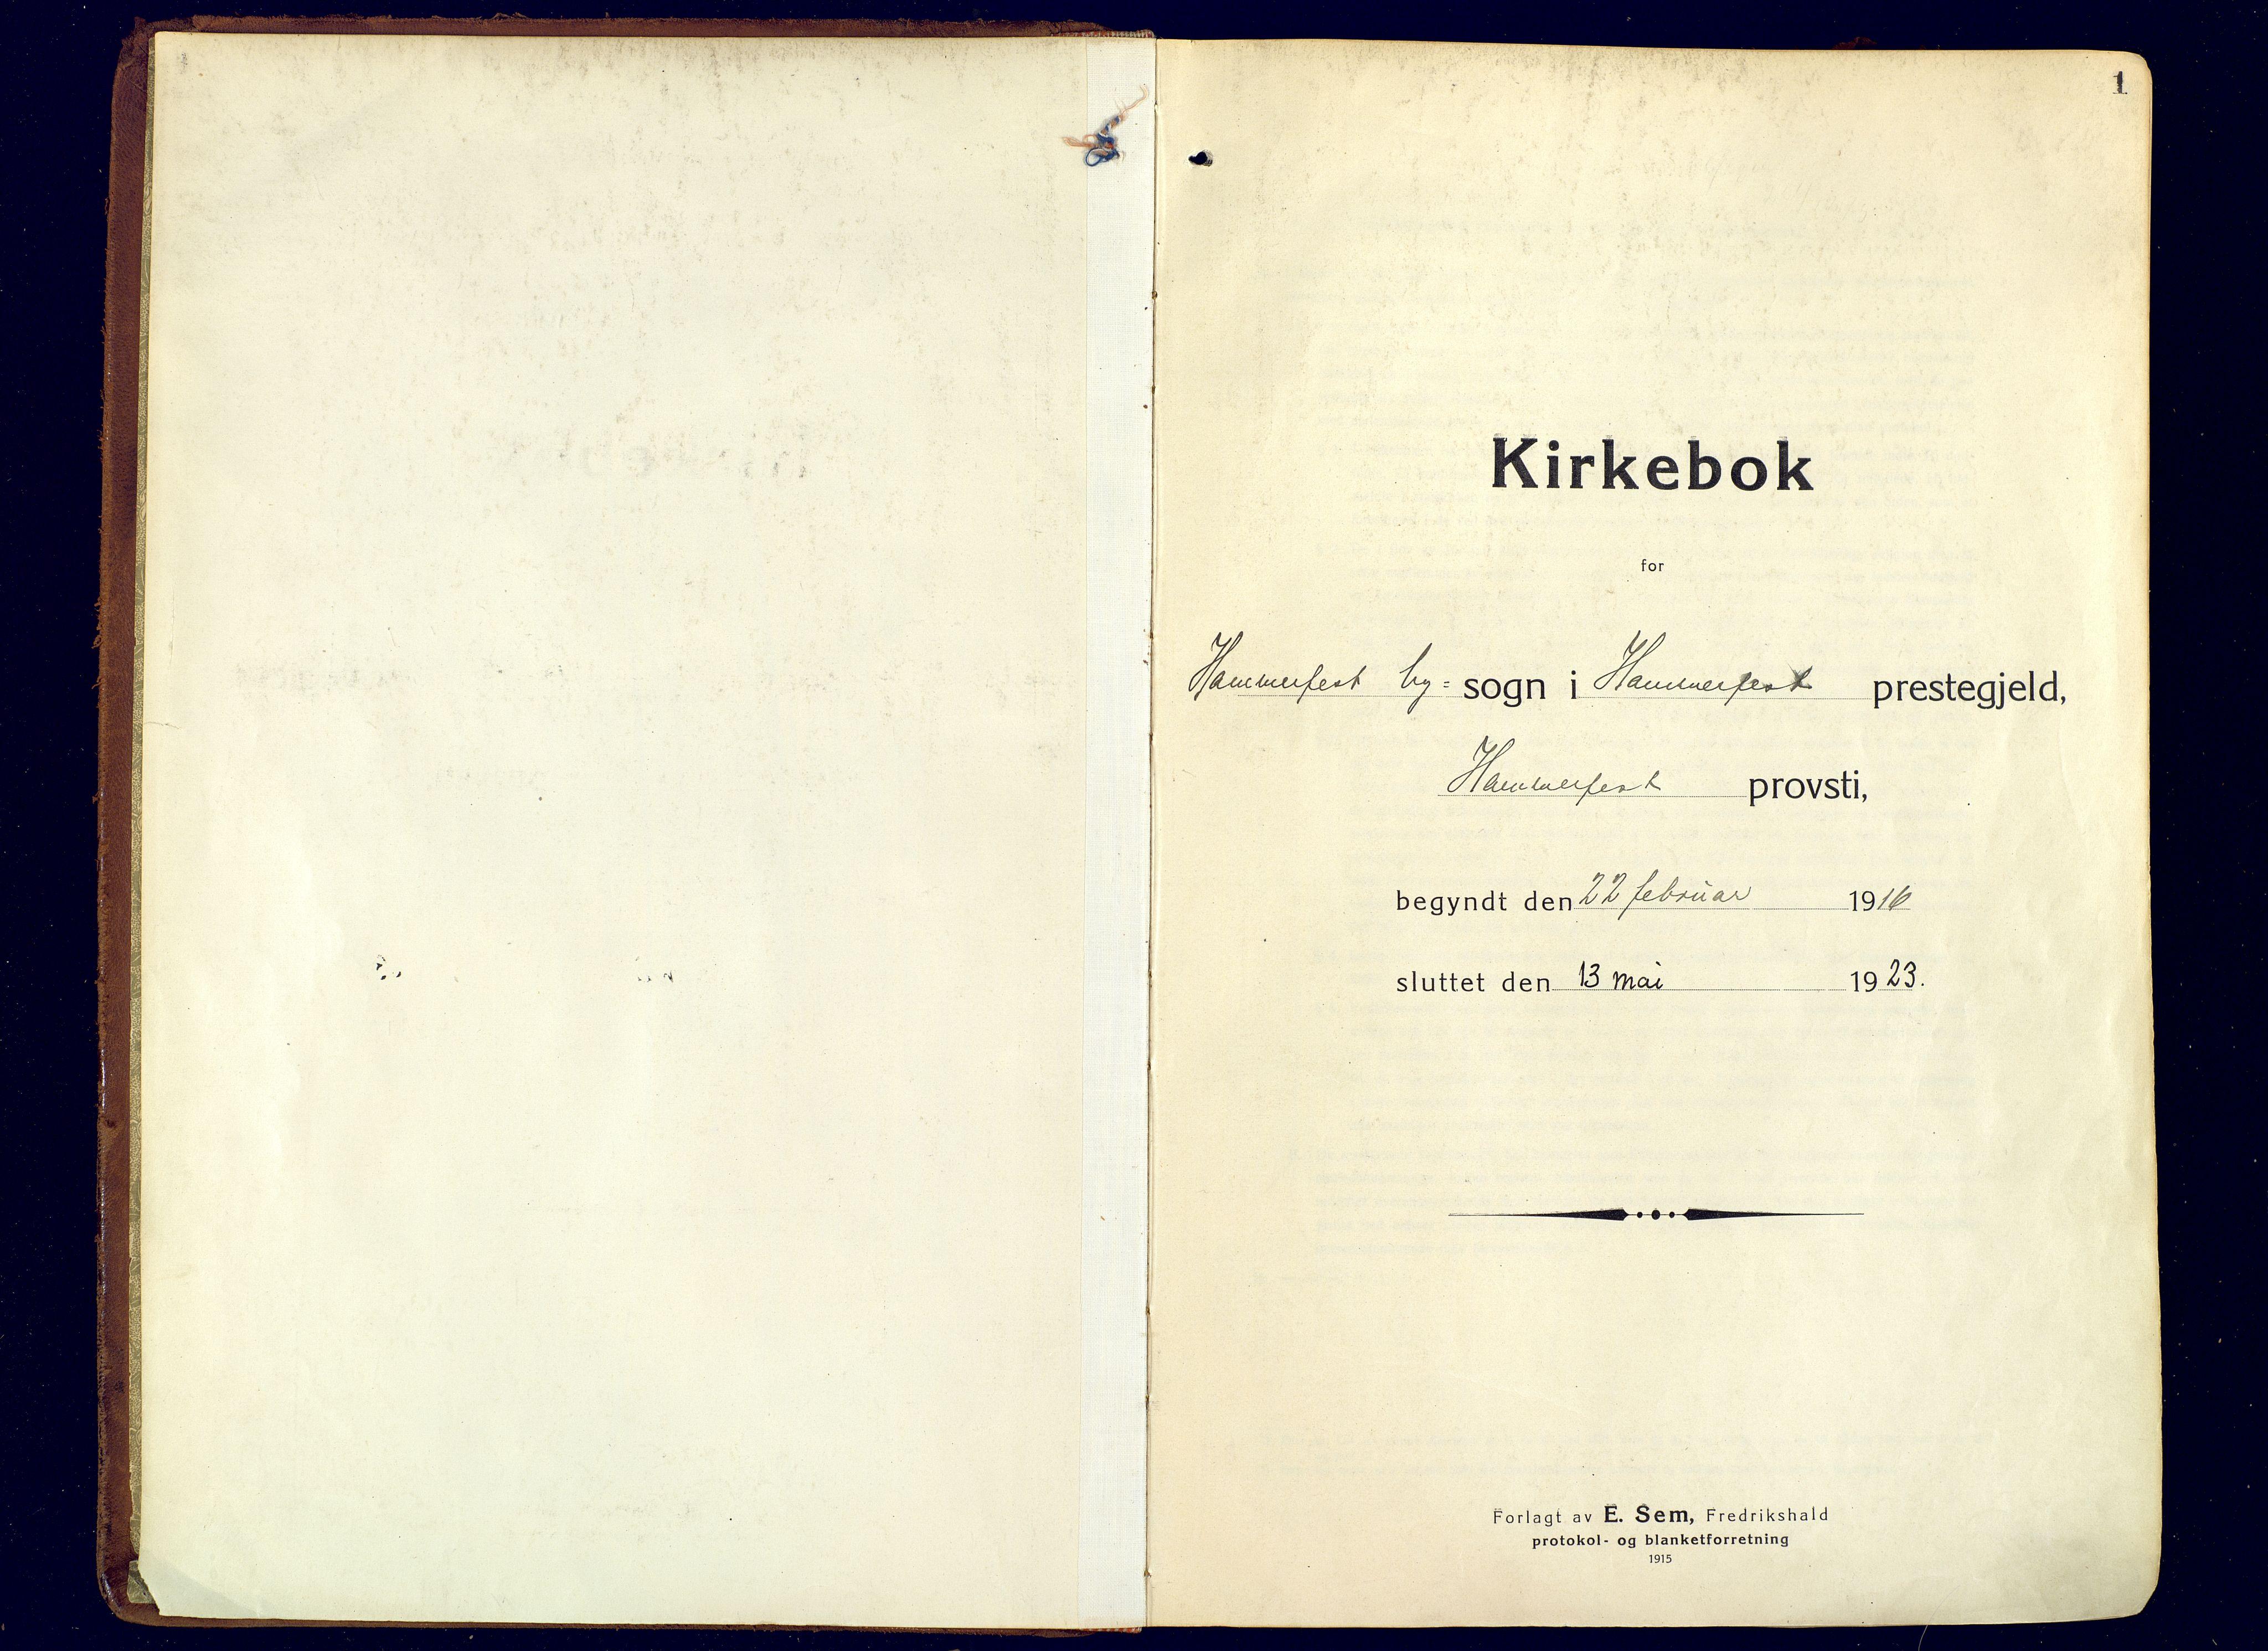 SATØ, Hammerfest sokneprestembete, Ministerialbok nr. 15, 1916-1923, s. 1